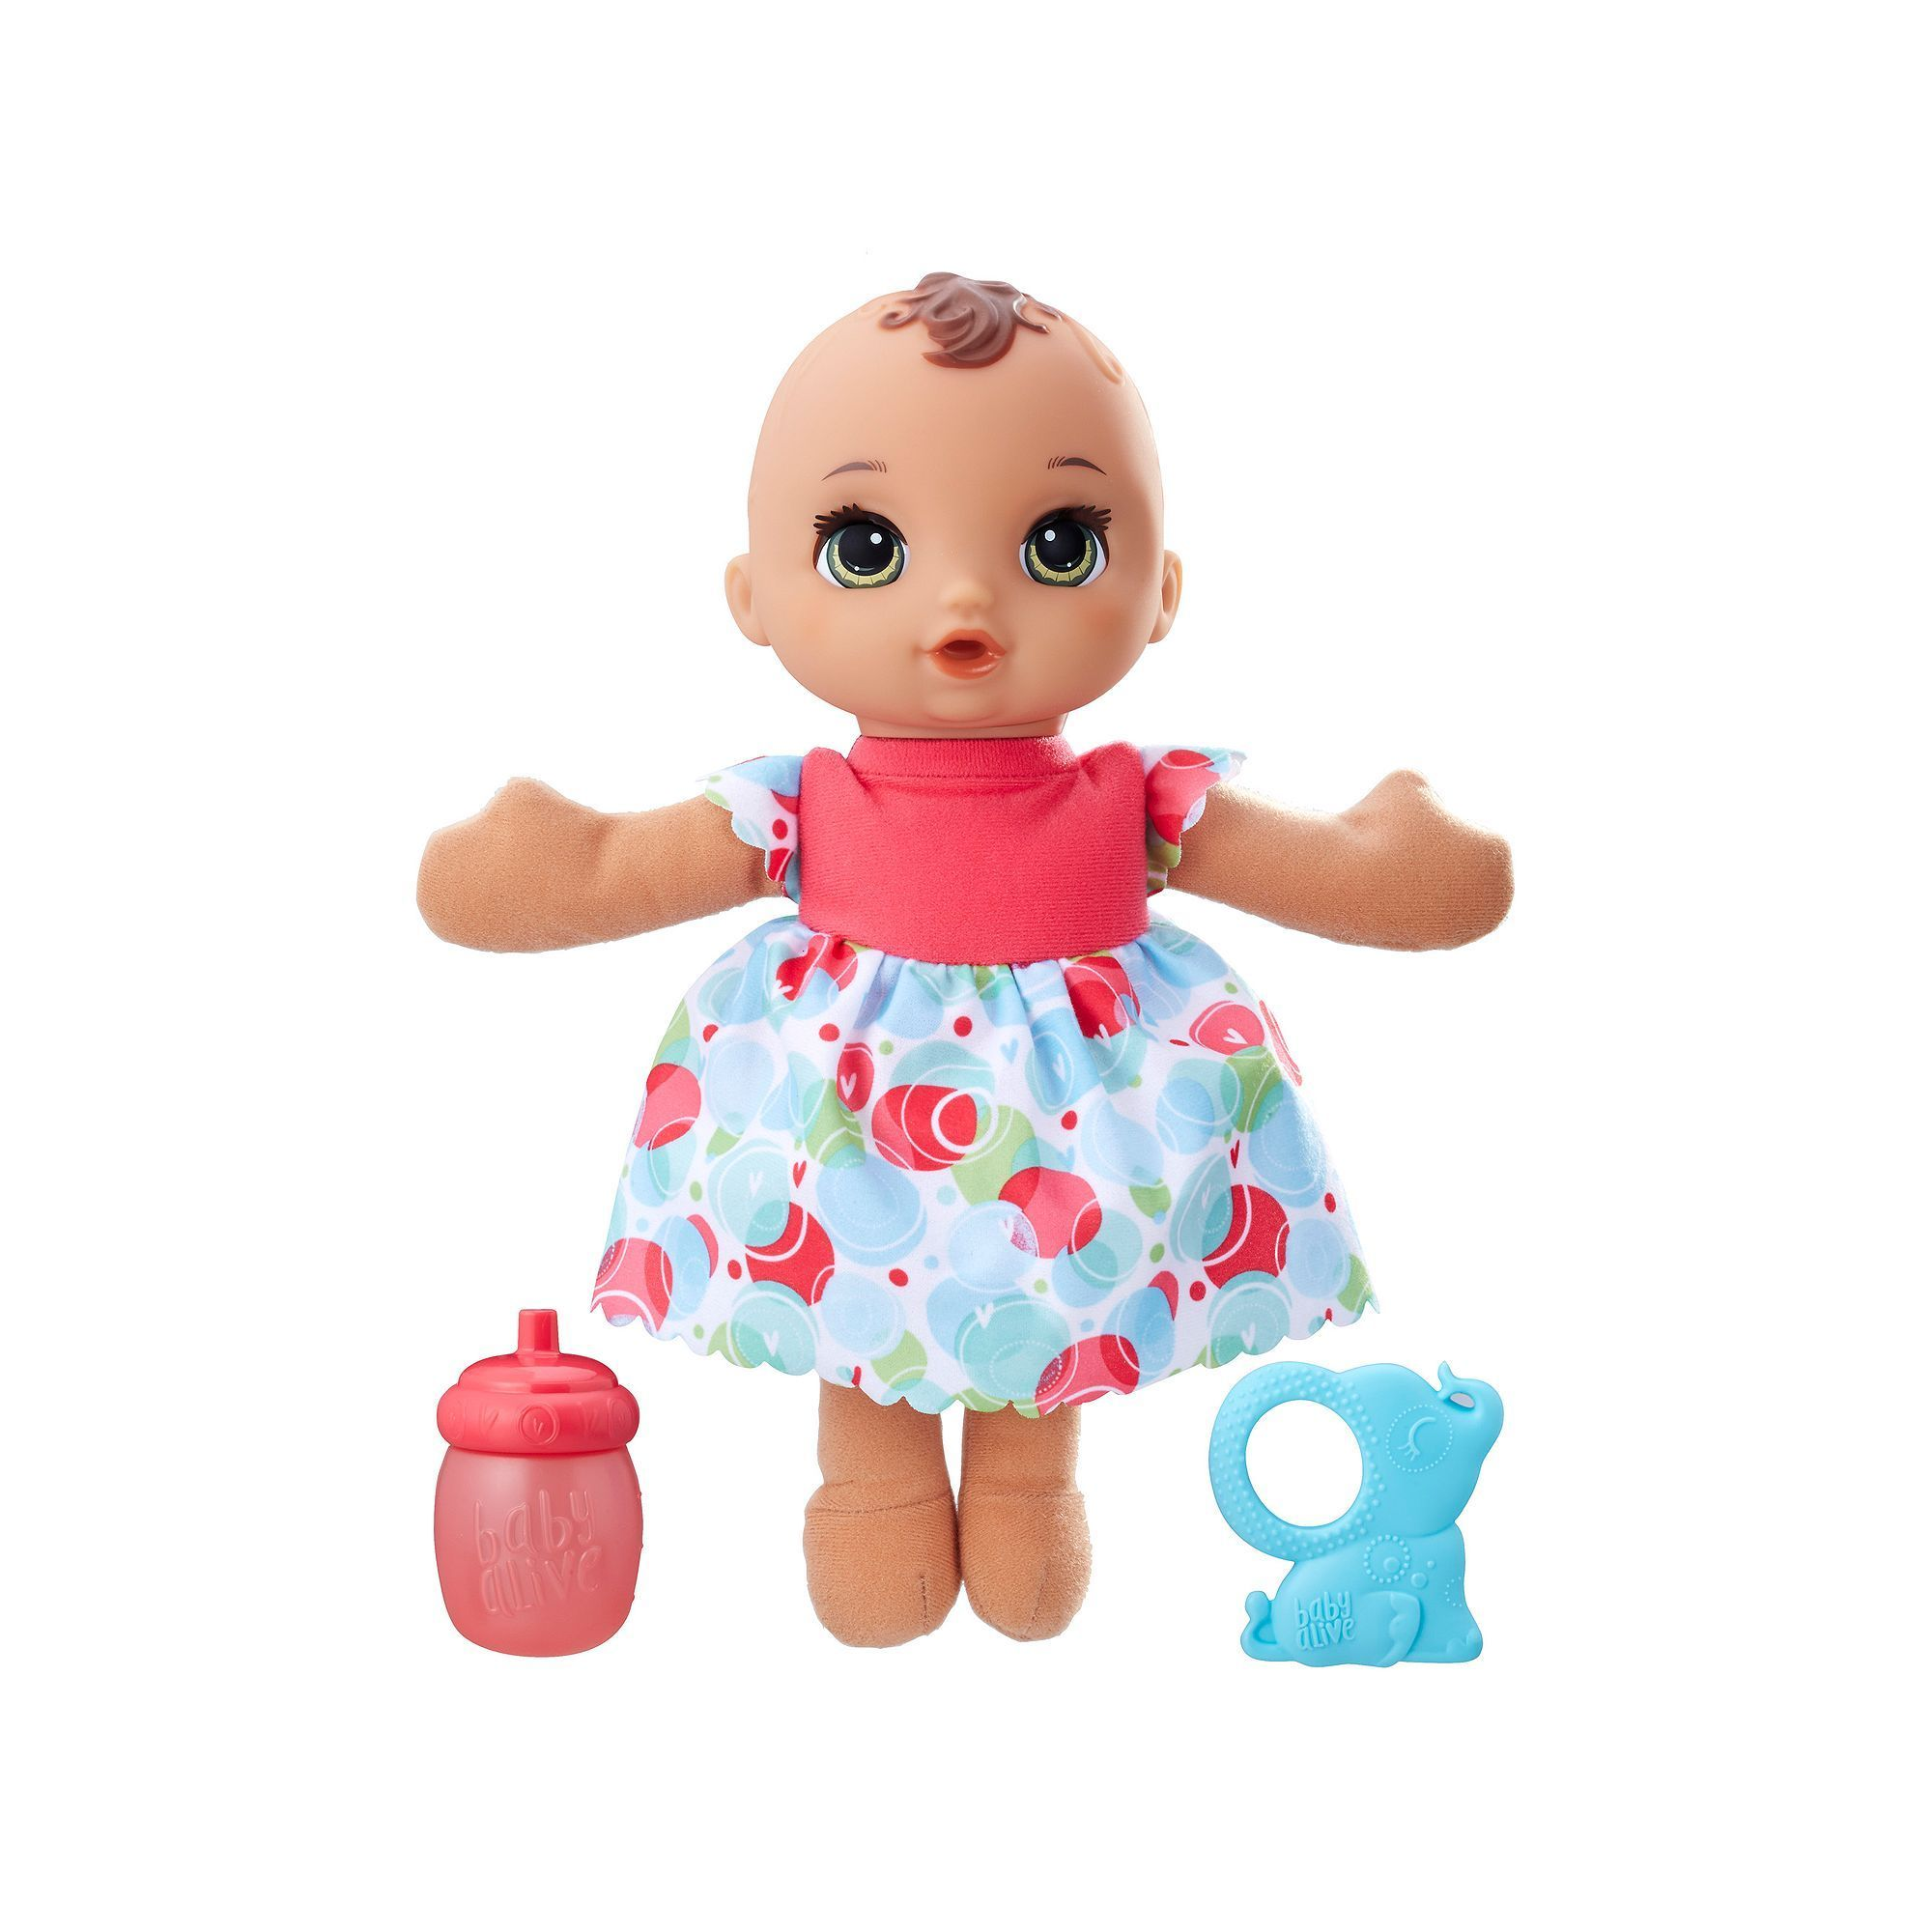 Baby Alive Lil Slumbers Brunette Baby Doll Multicolor